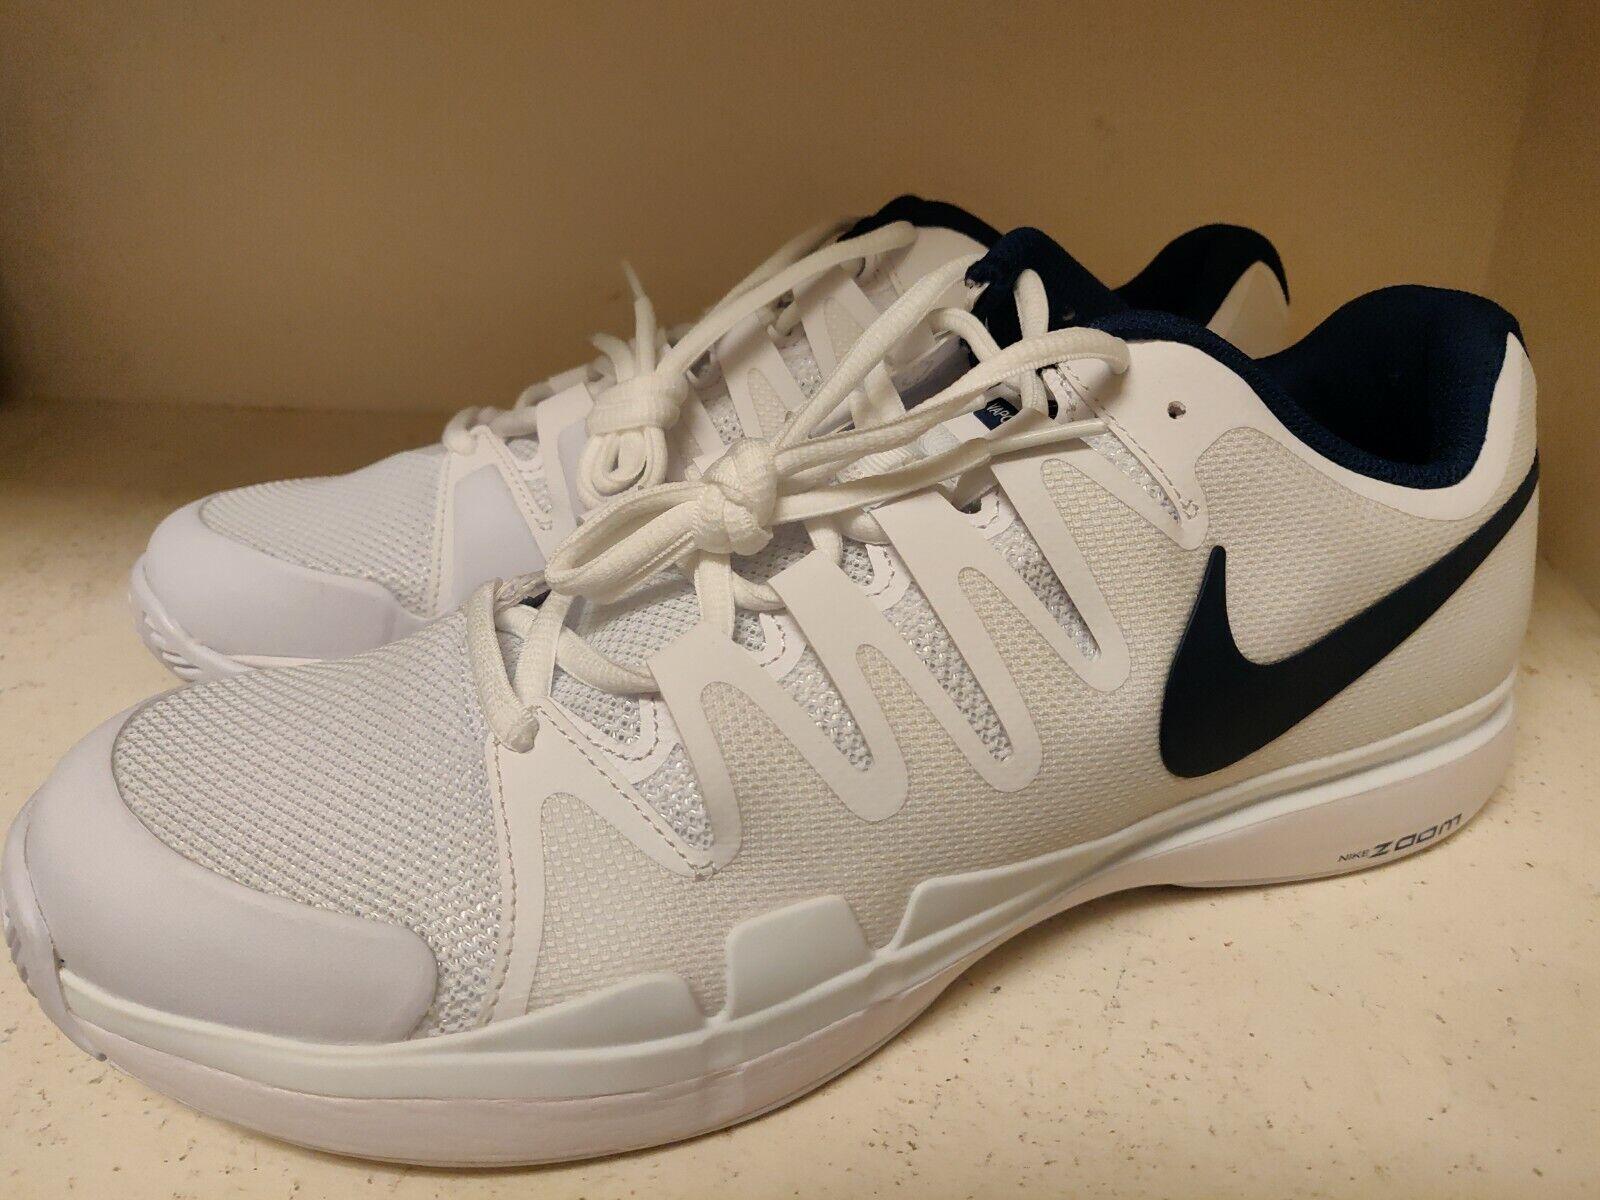 Nike  Men's  size 11.5 ZOOM Vapor 9.5 Tour   WHITE/BINARY BLUE 631458-104